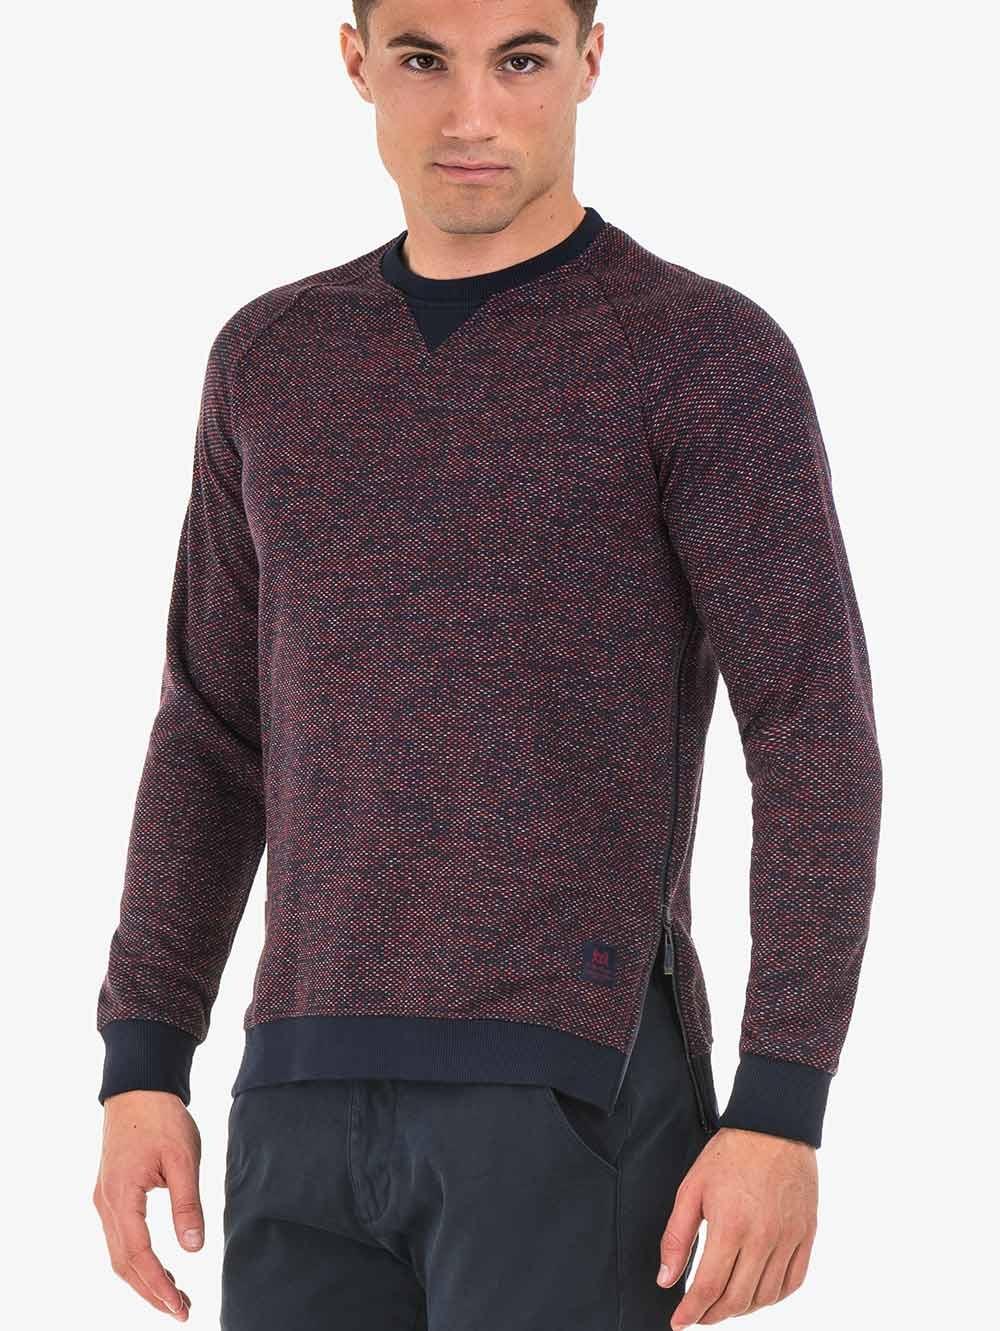 27e5f9635b5 Мъжки пуловер MCL - бордо   Пуловери от INDIGO Fashion